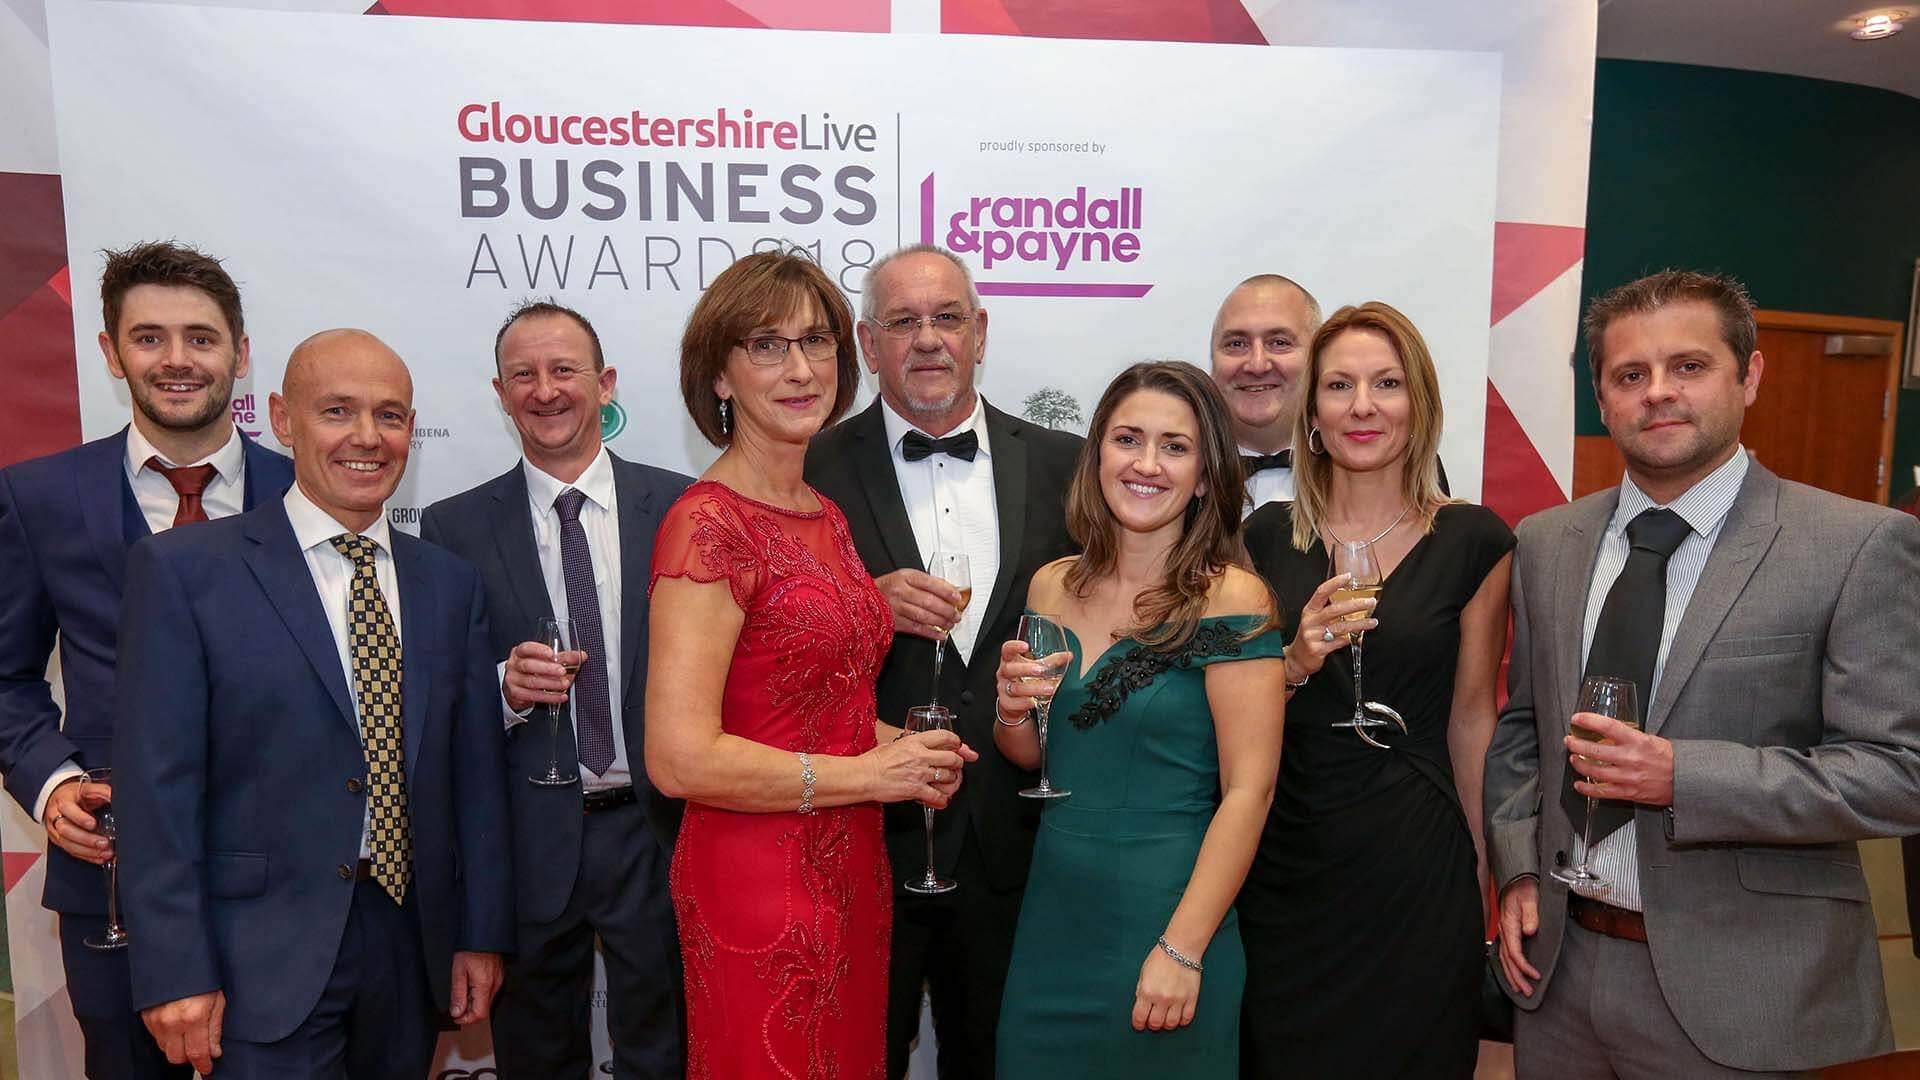 Gloucestershire Business Award Winners 2018 1